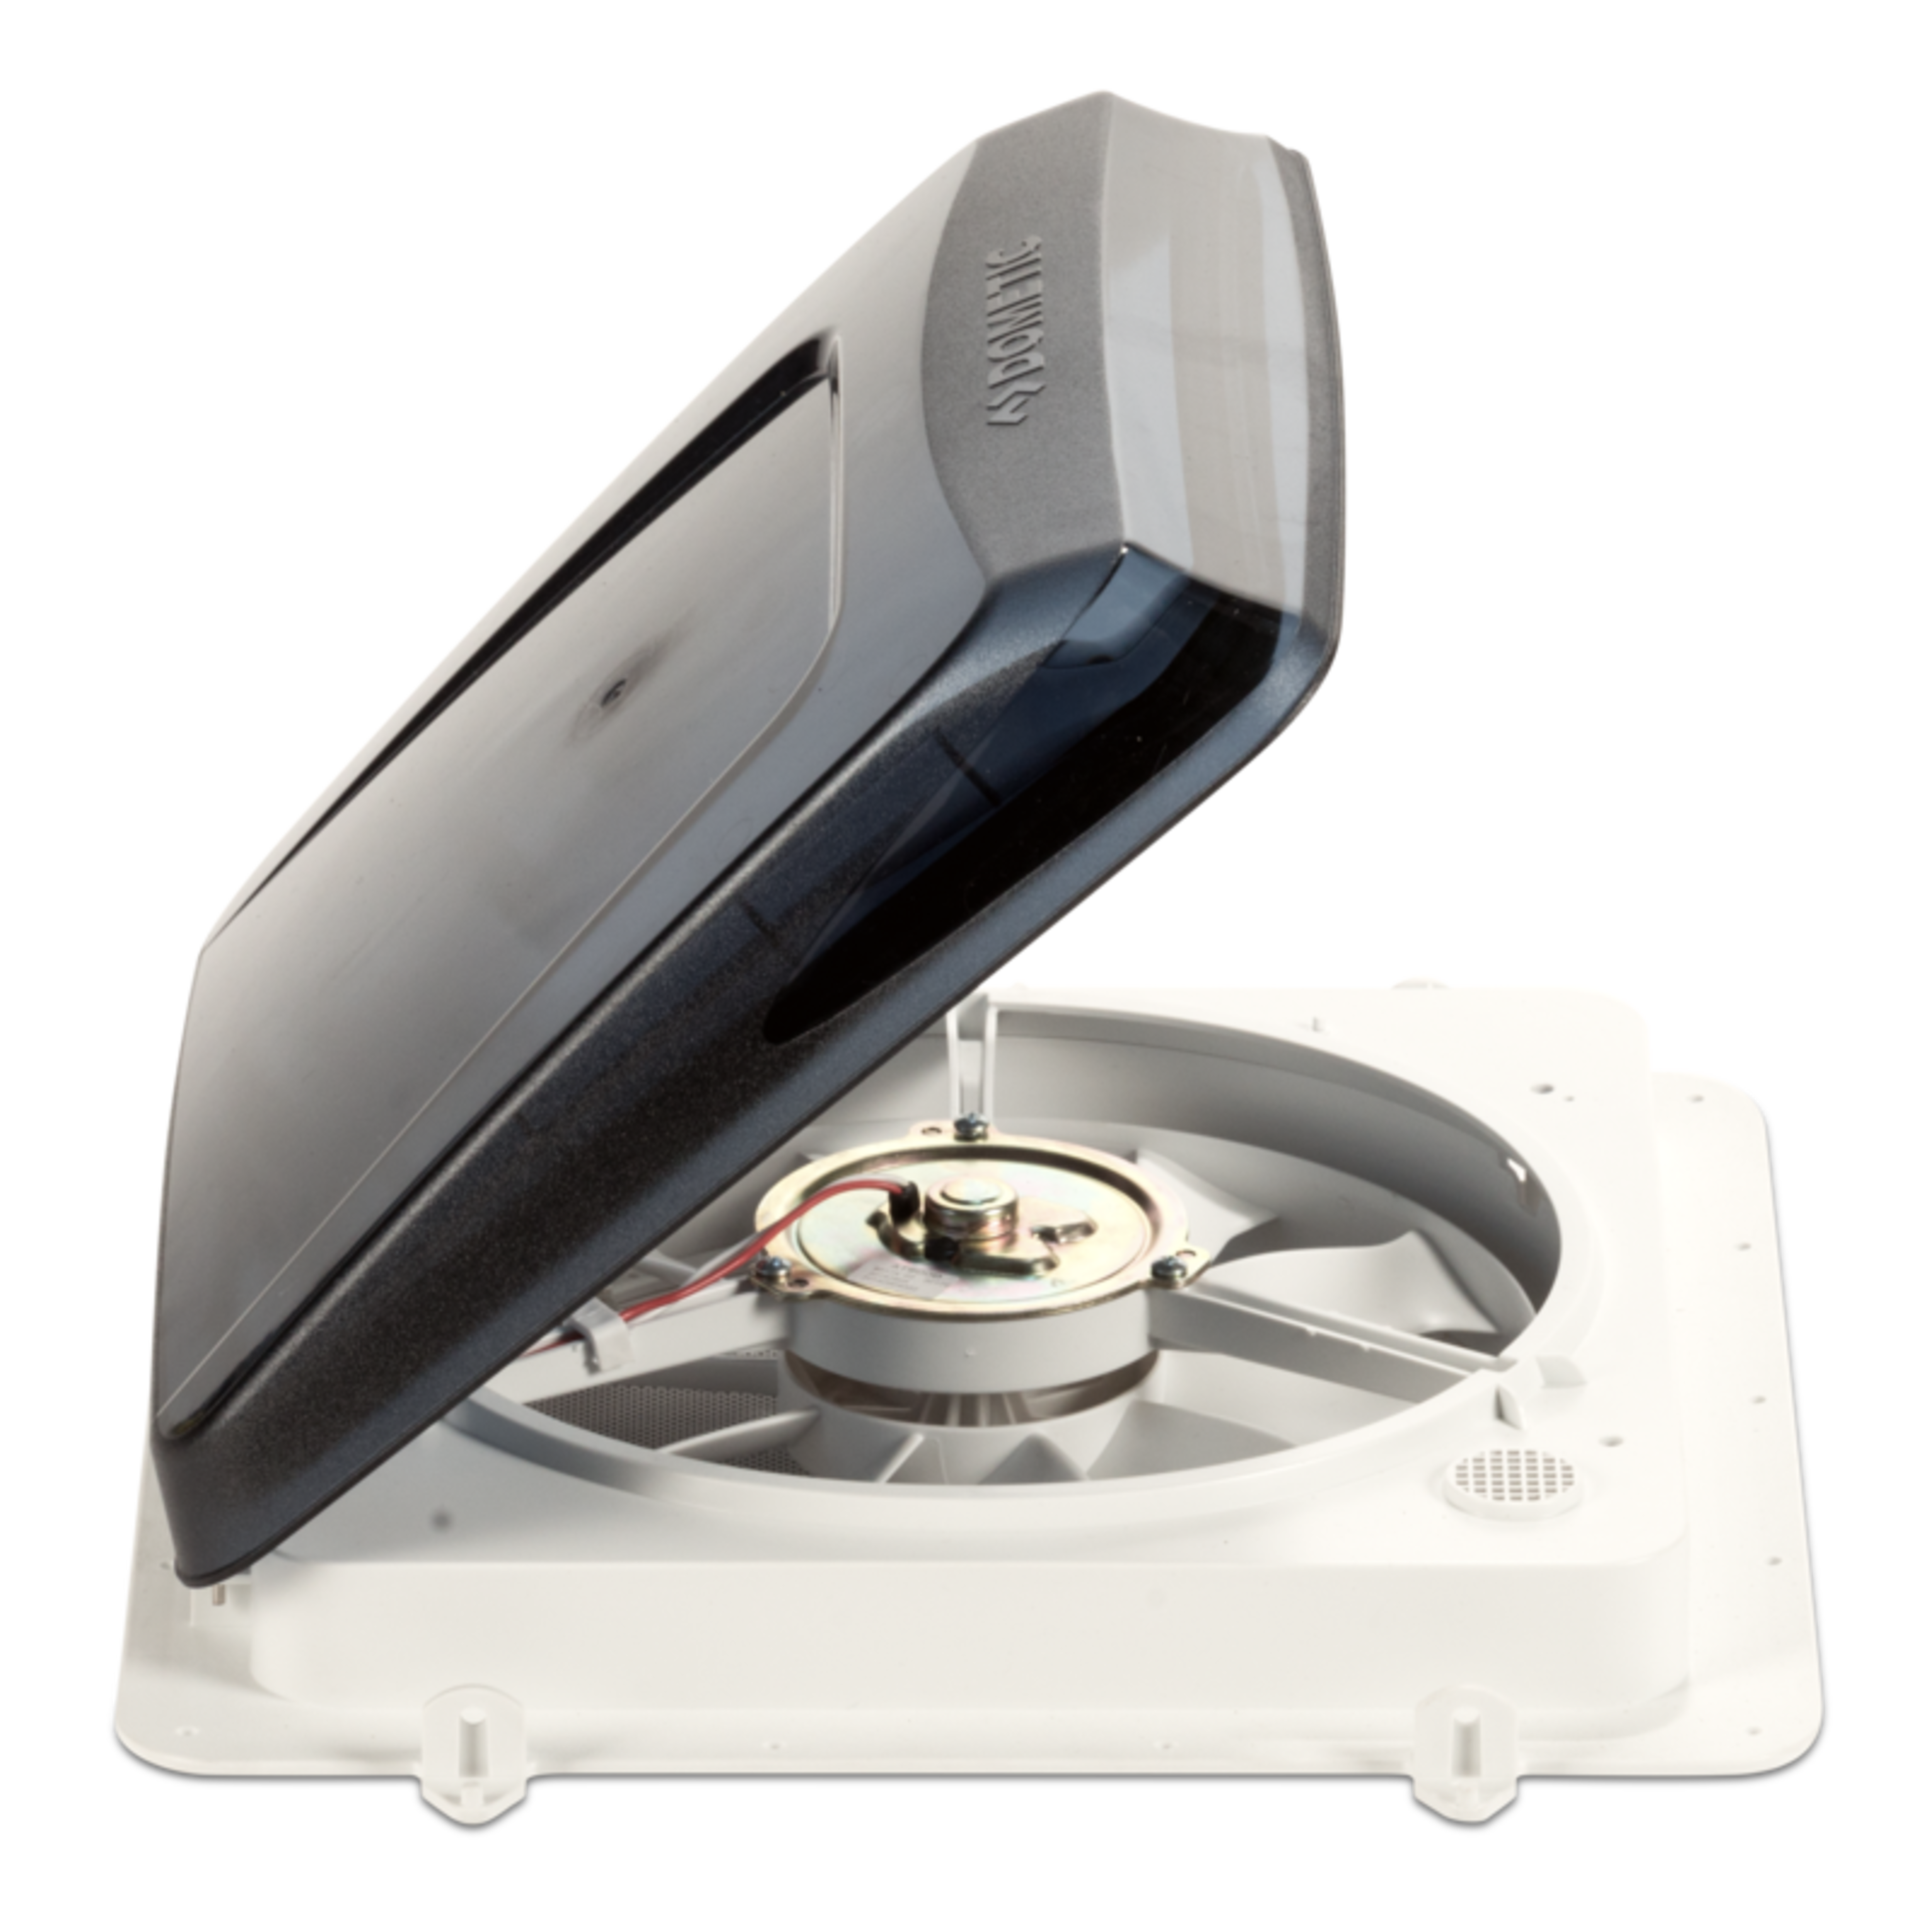 Dometic Fan-Tastic Vent 1450